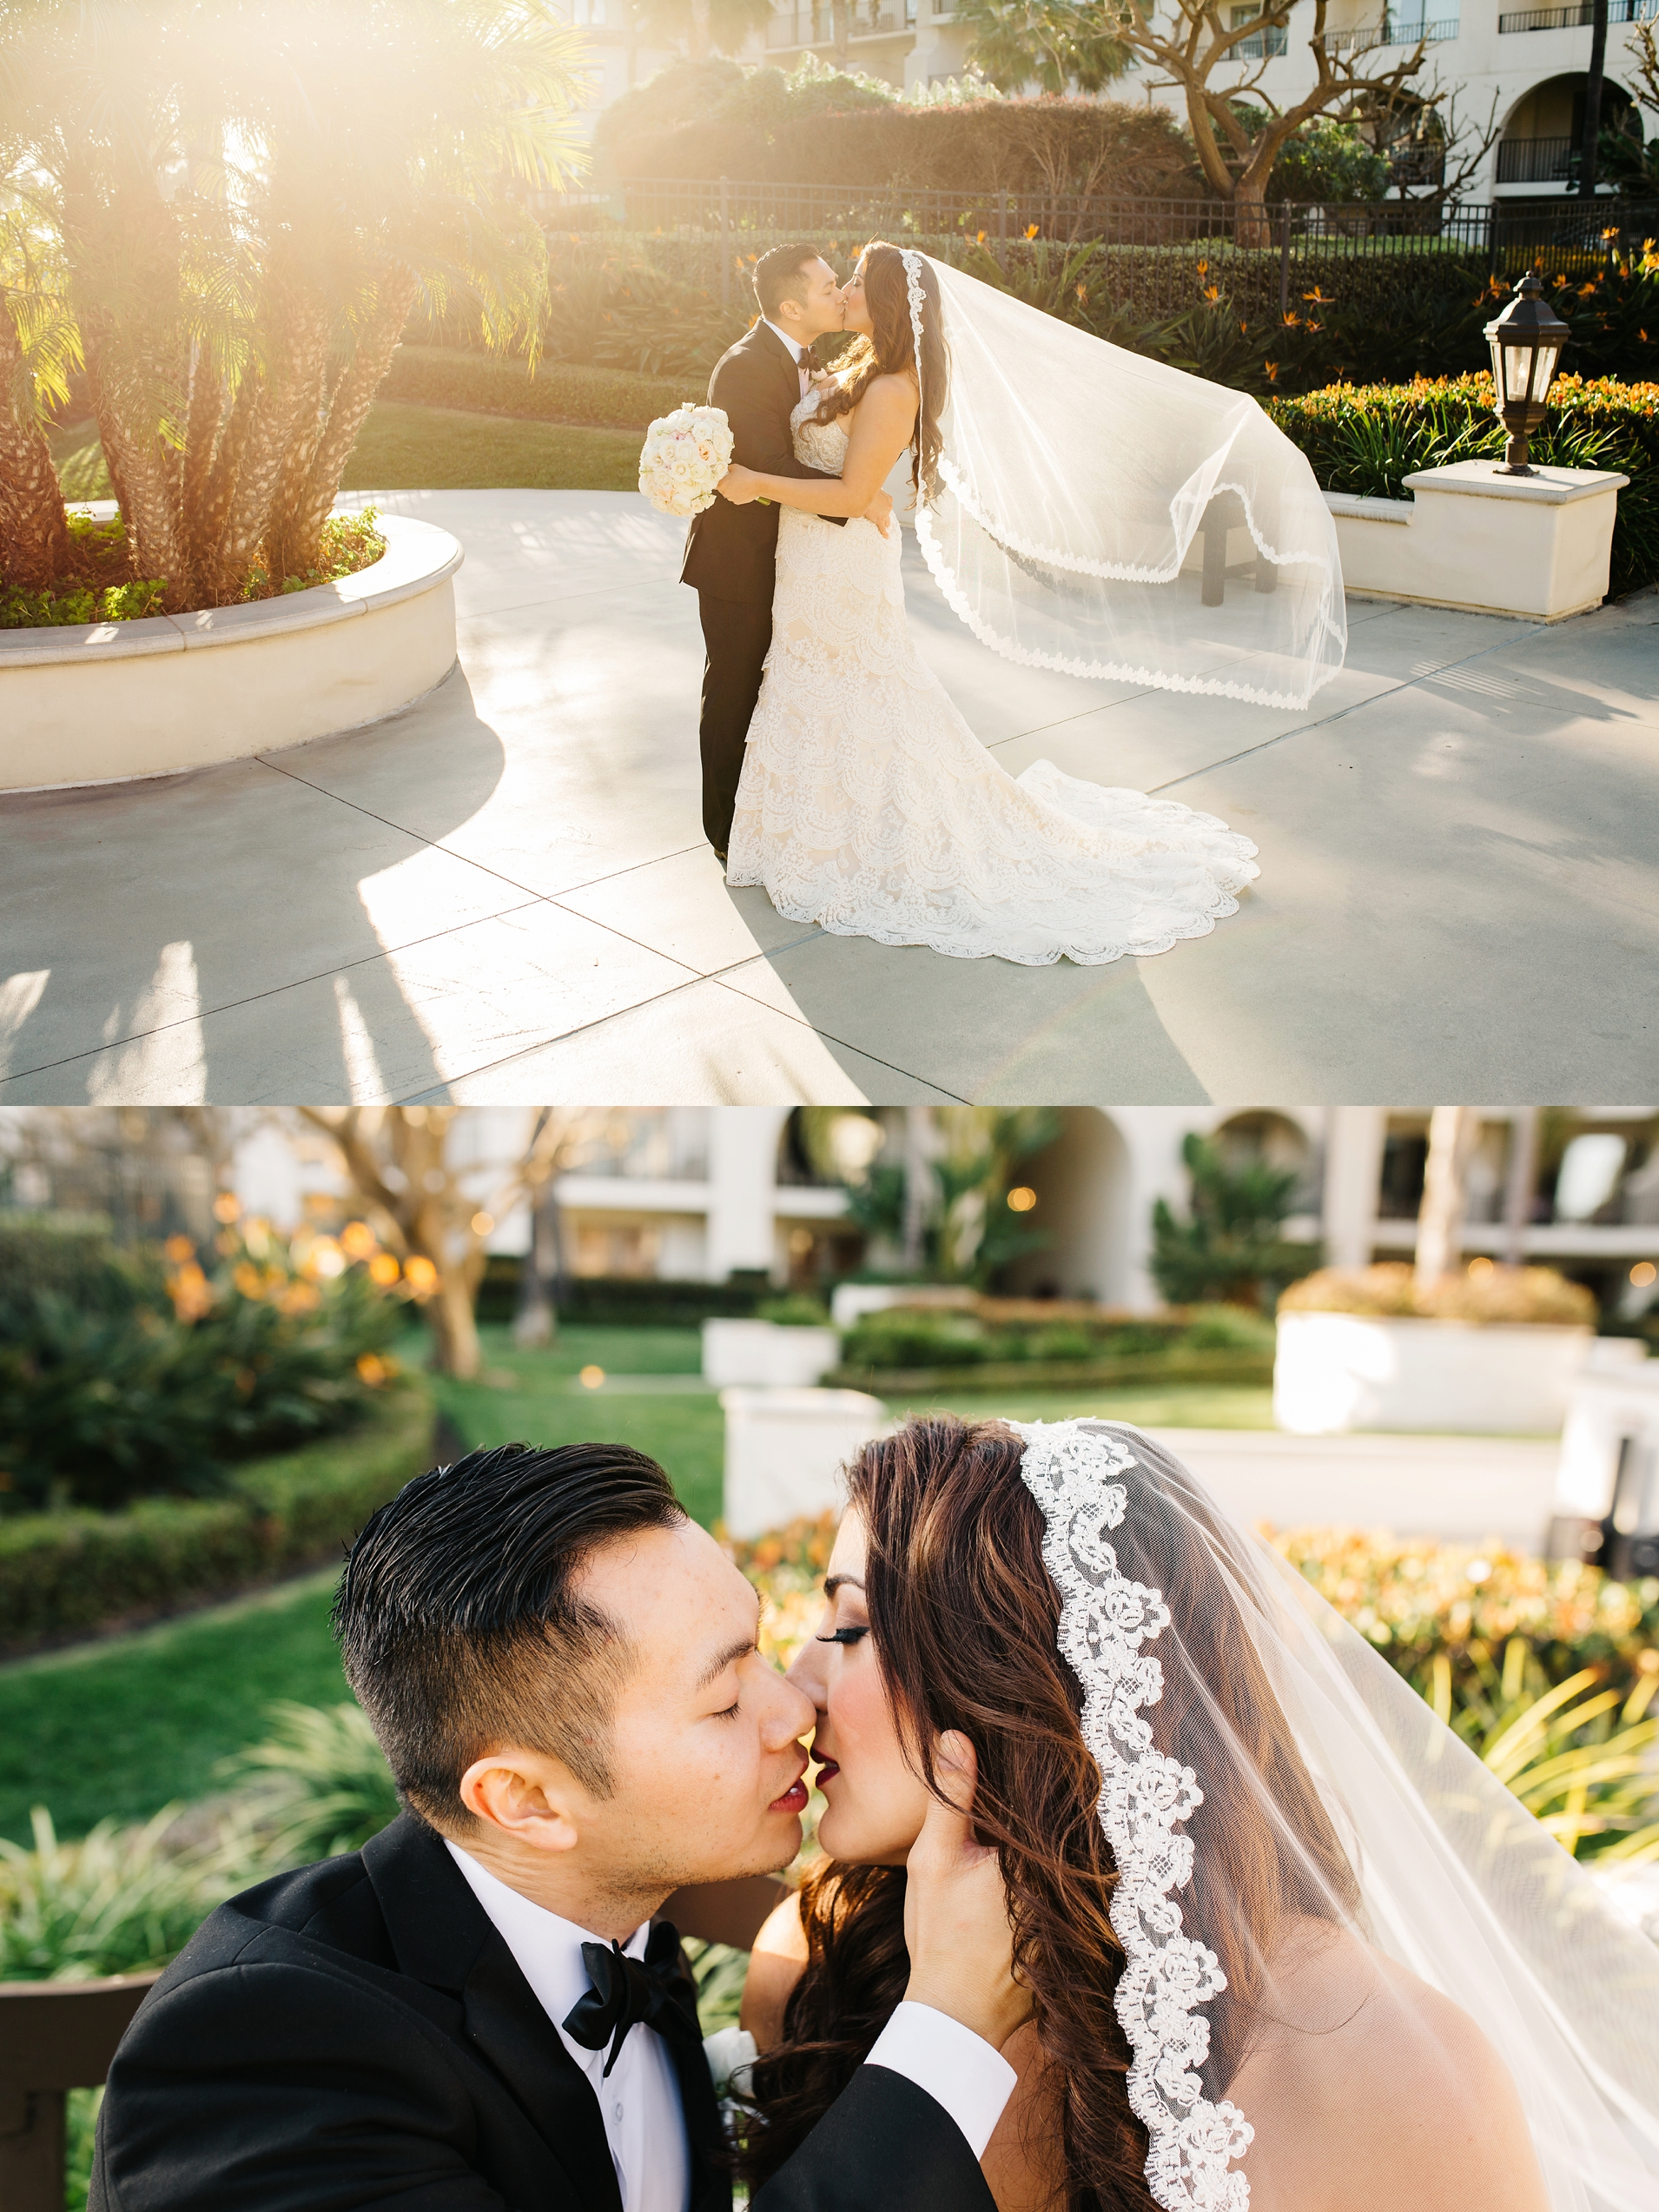 Sunset Bride and Groom Pictures-Huntington Beach Wedding-OC Wedding Photographer